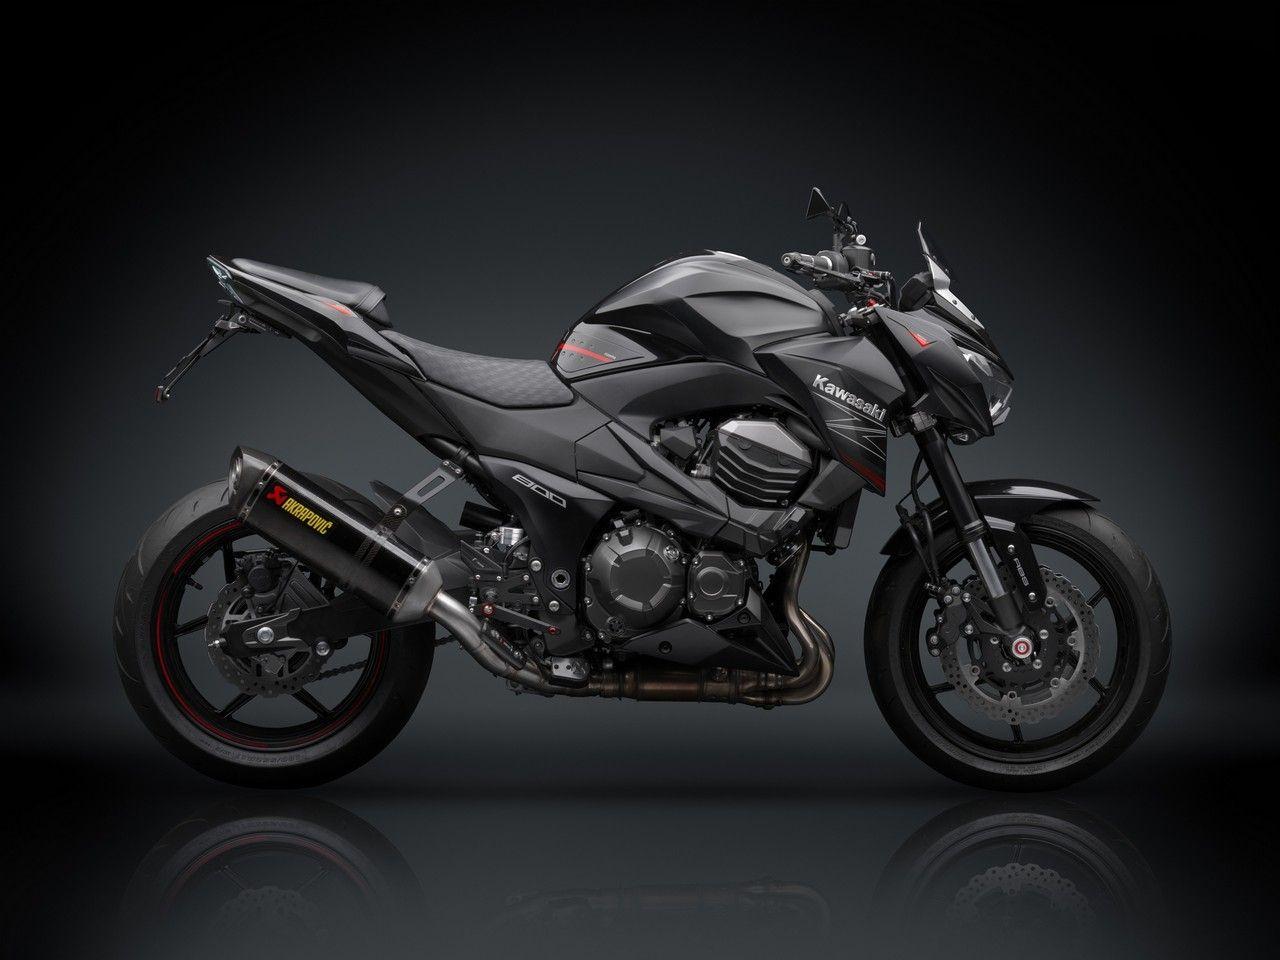 Kawasaki Z800 2013 Rizoma